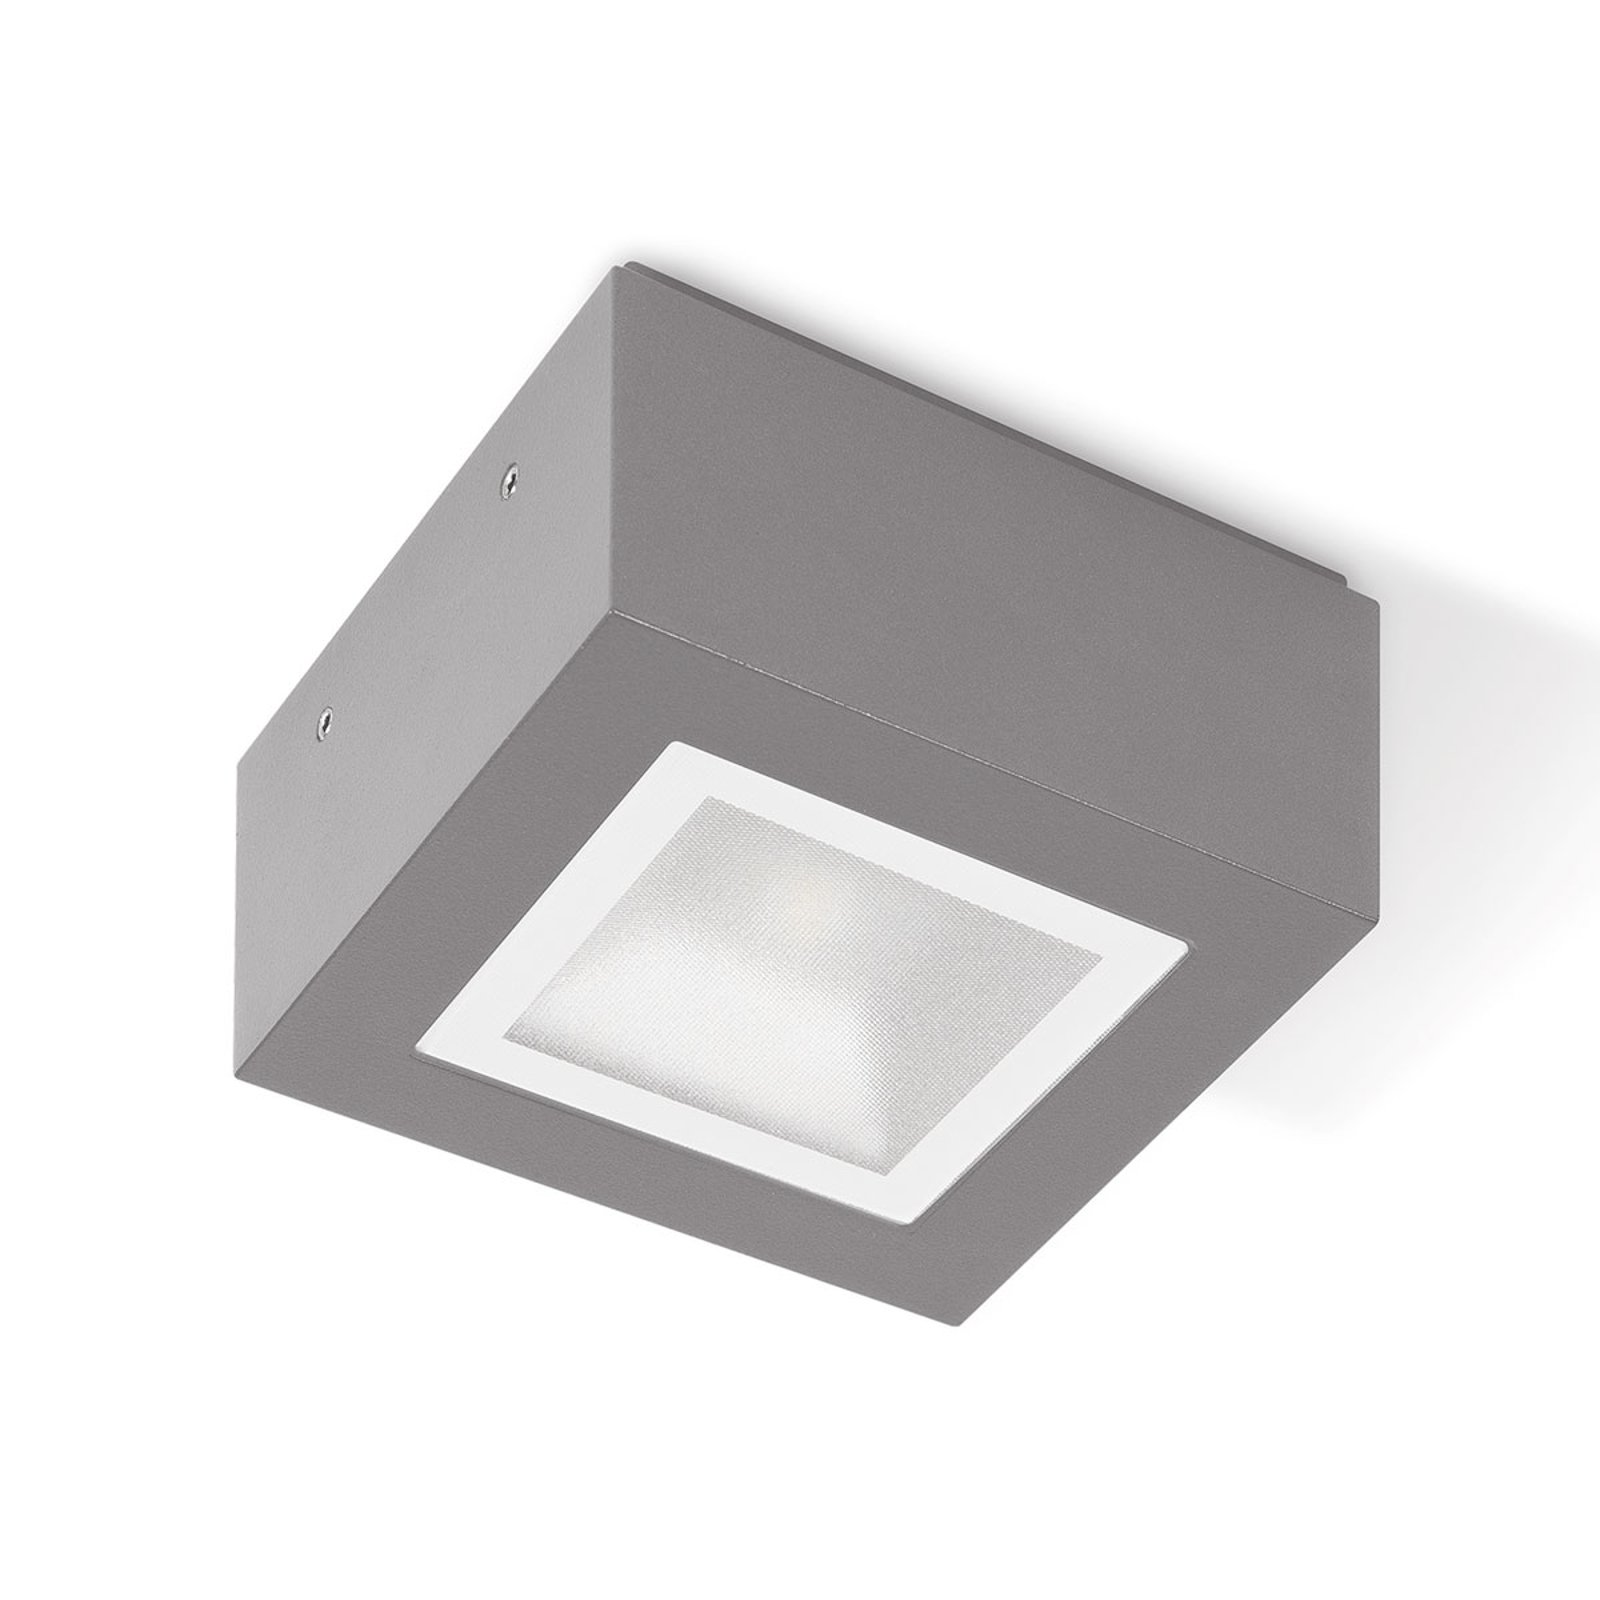 LED-taklampe Mimik 10 Tech Mikroprisma 3 000 K